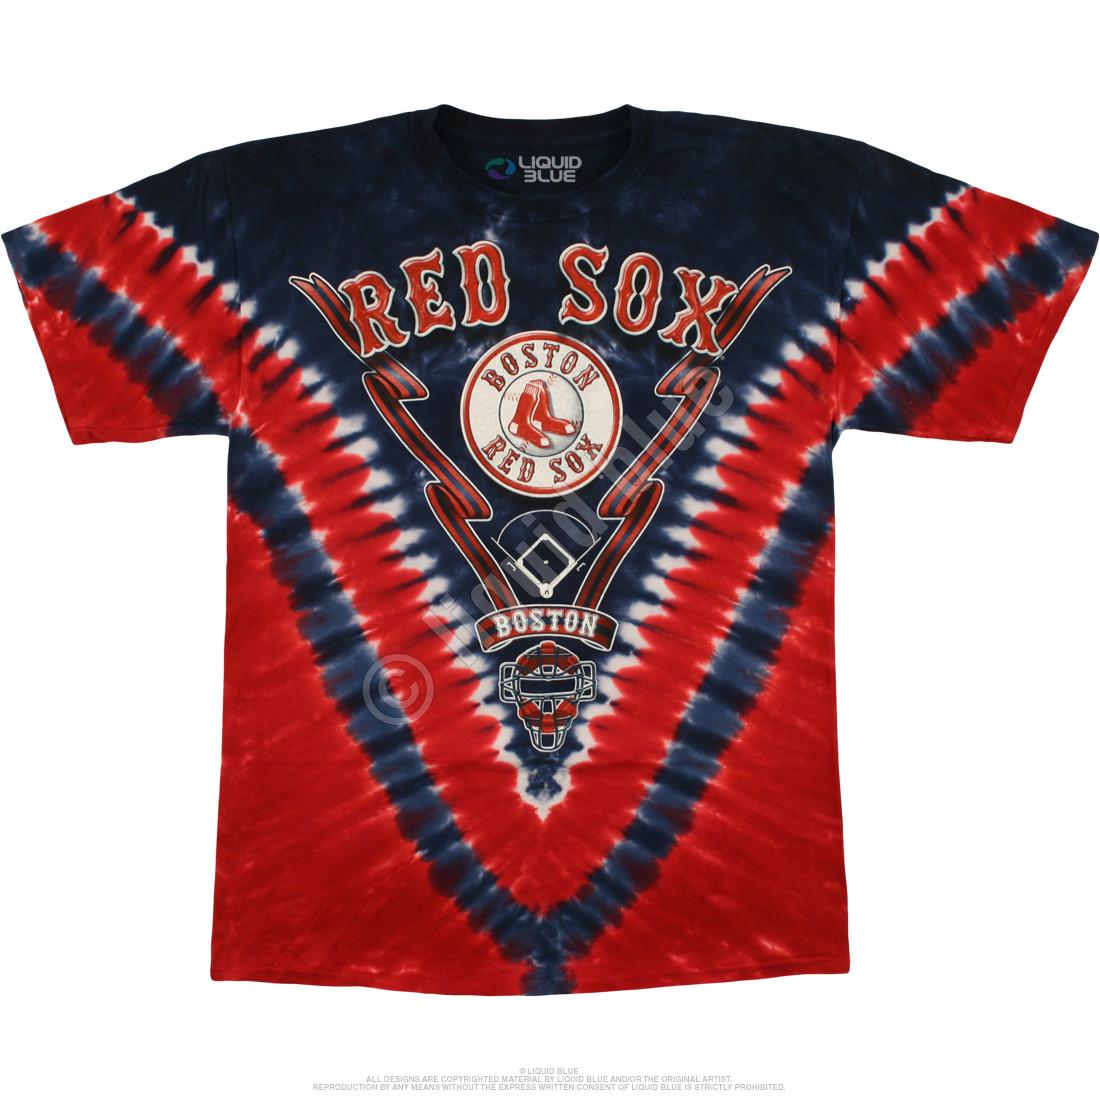 Mlb boston red sox v tie dye t shirt tee liquid blue for How to dye a shirt red